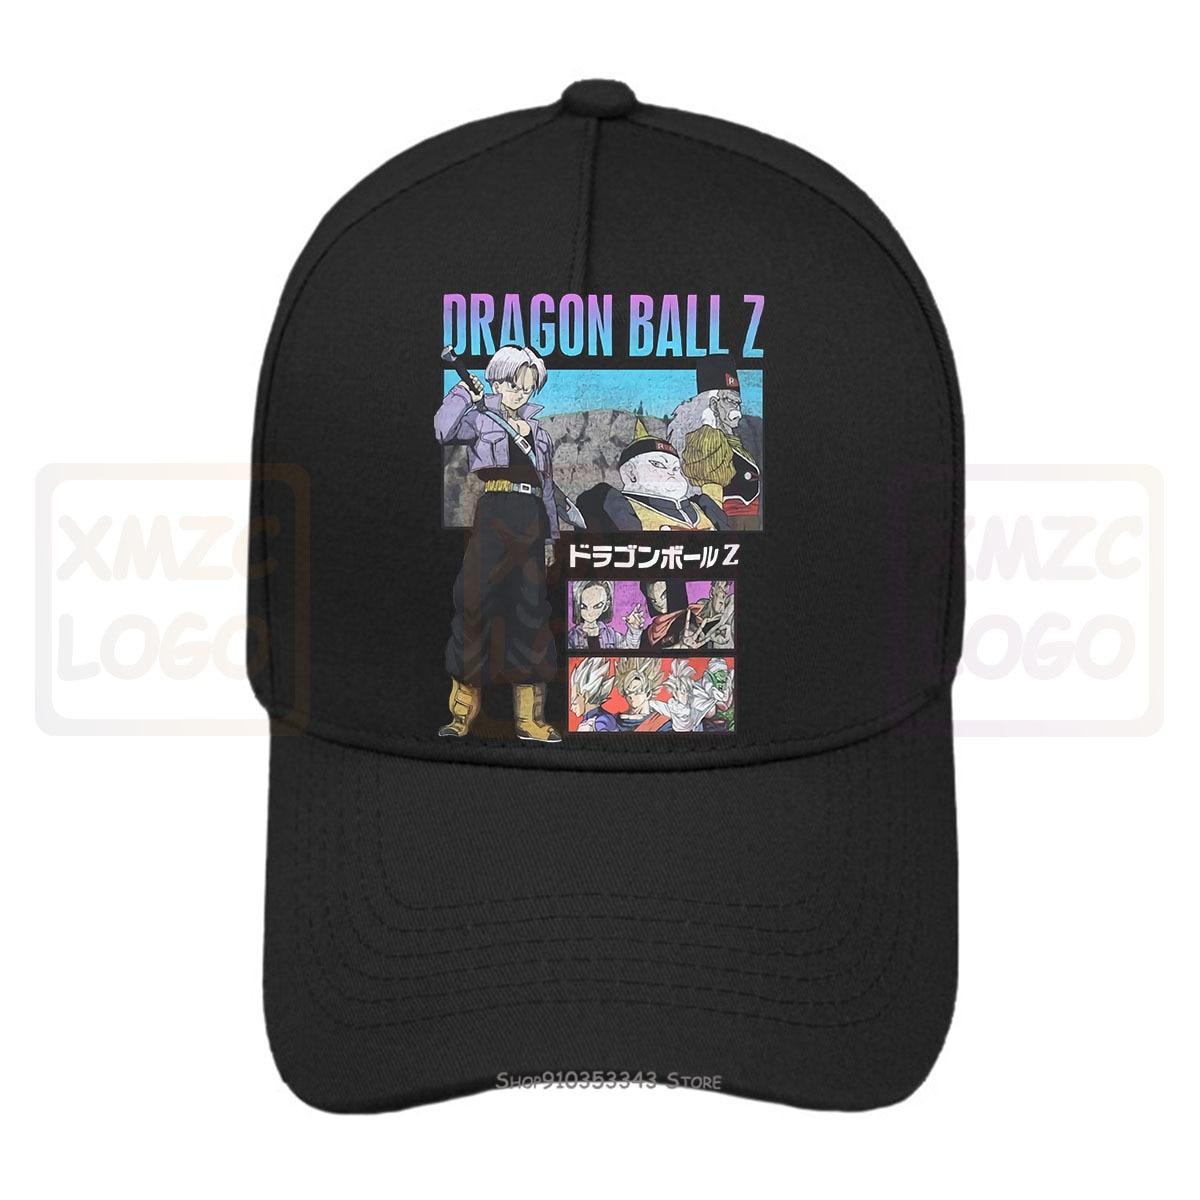 Dragon Kemeja Pria Ball Z Masa Depan Batang Kaos бейсбольная кепка Terbaru бейсболка шапки для женщин и мужчин